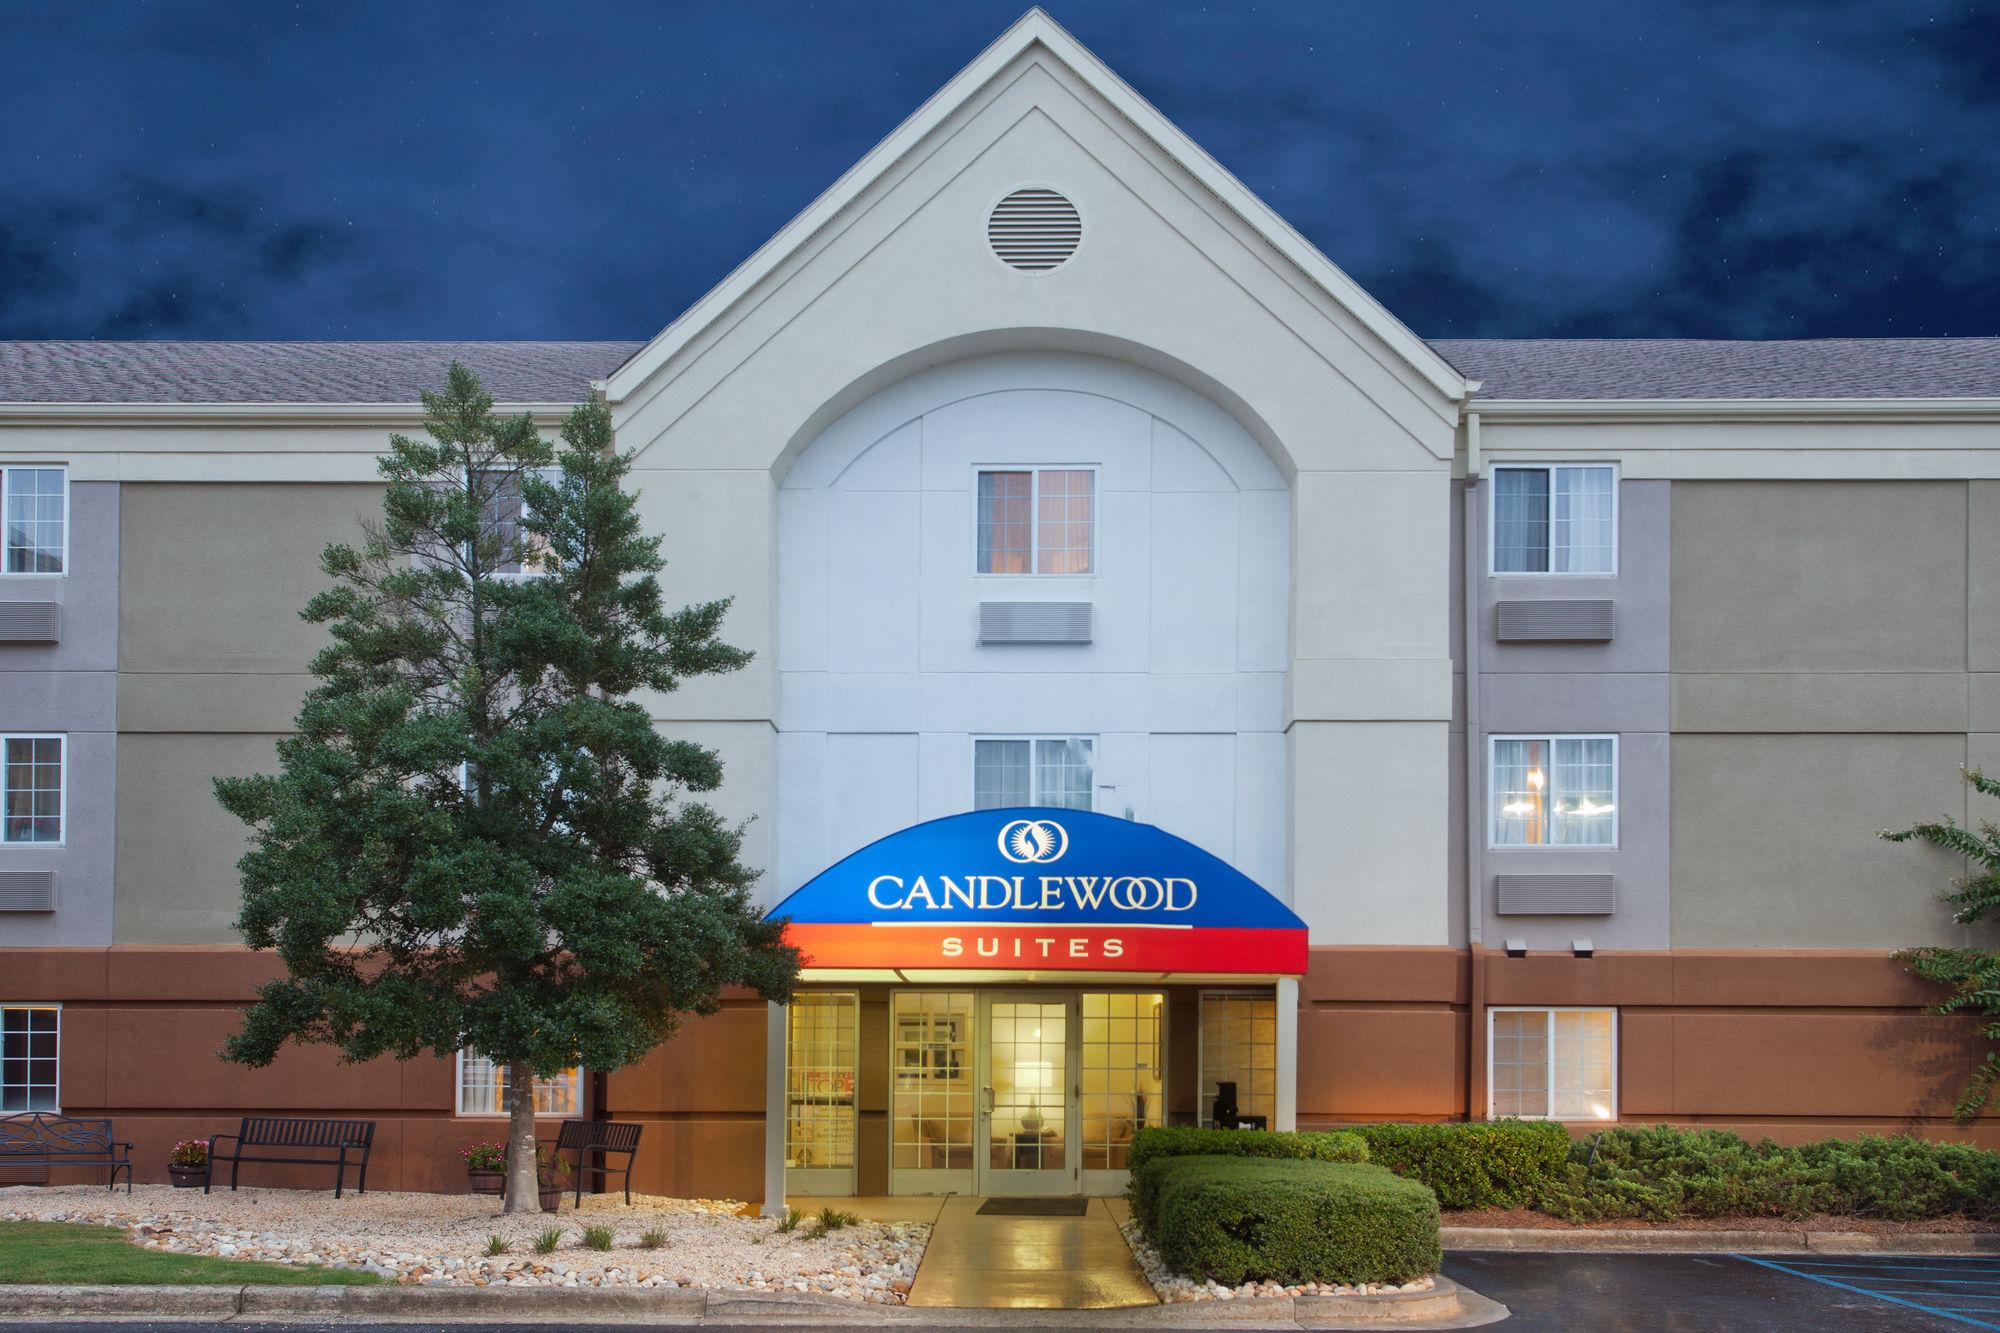 Candlewood Suites Birmingham - Hoover in Birmingham, AL